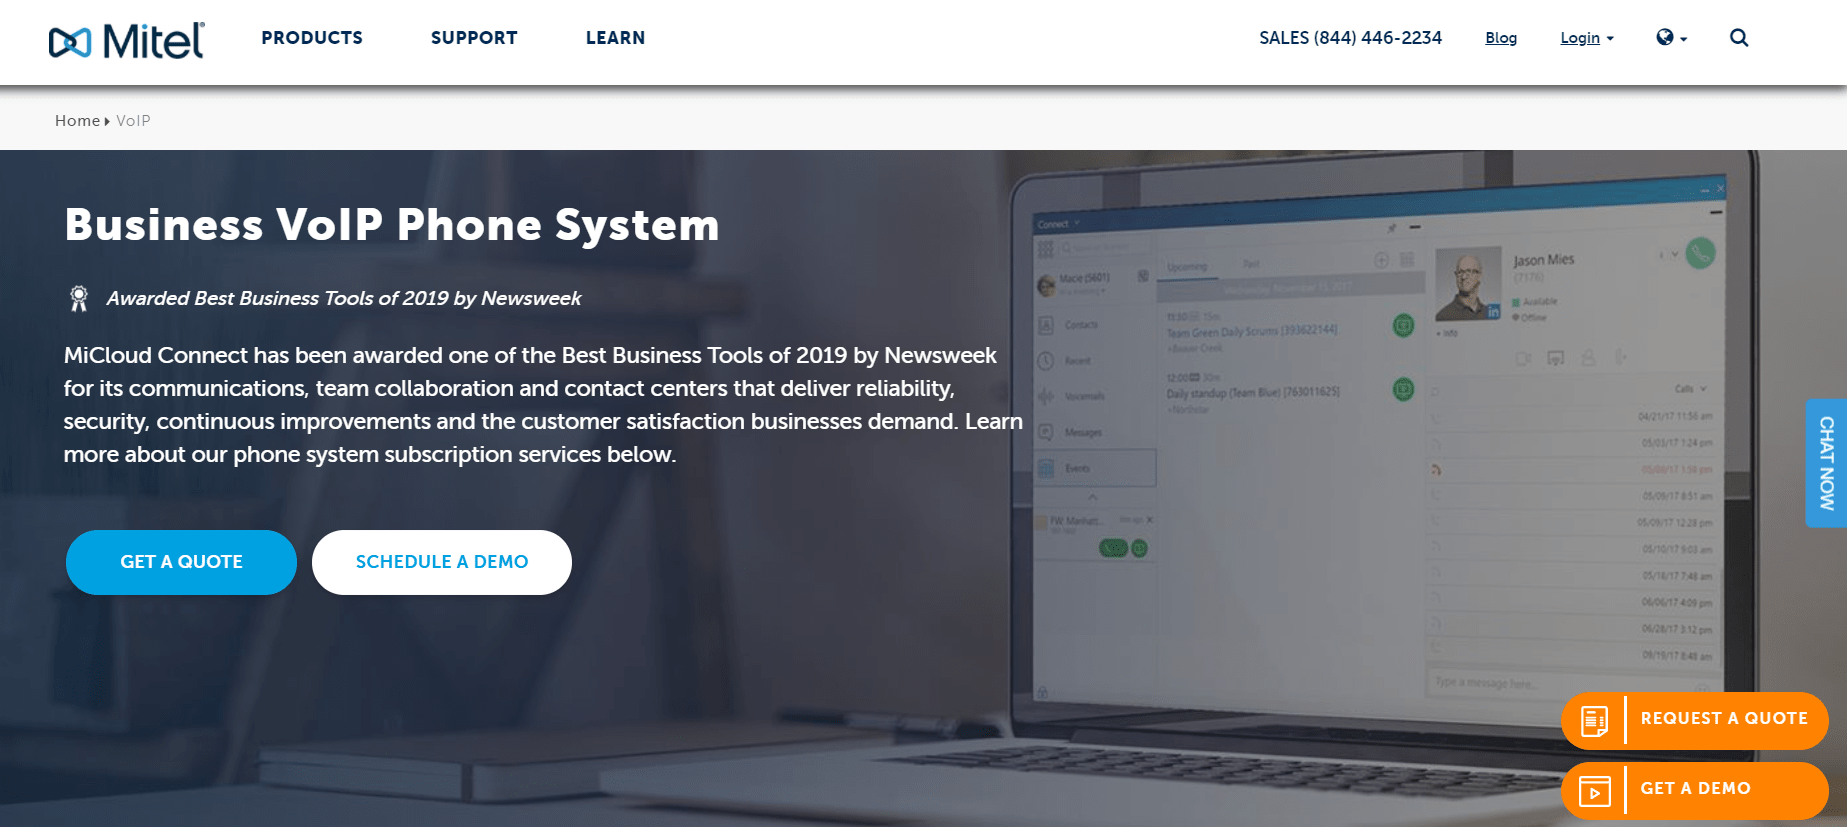 Mitel Virtual Phone Number Providers in Australia